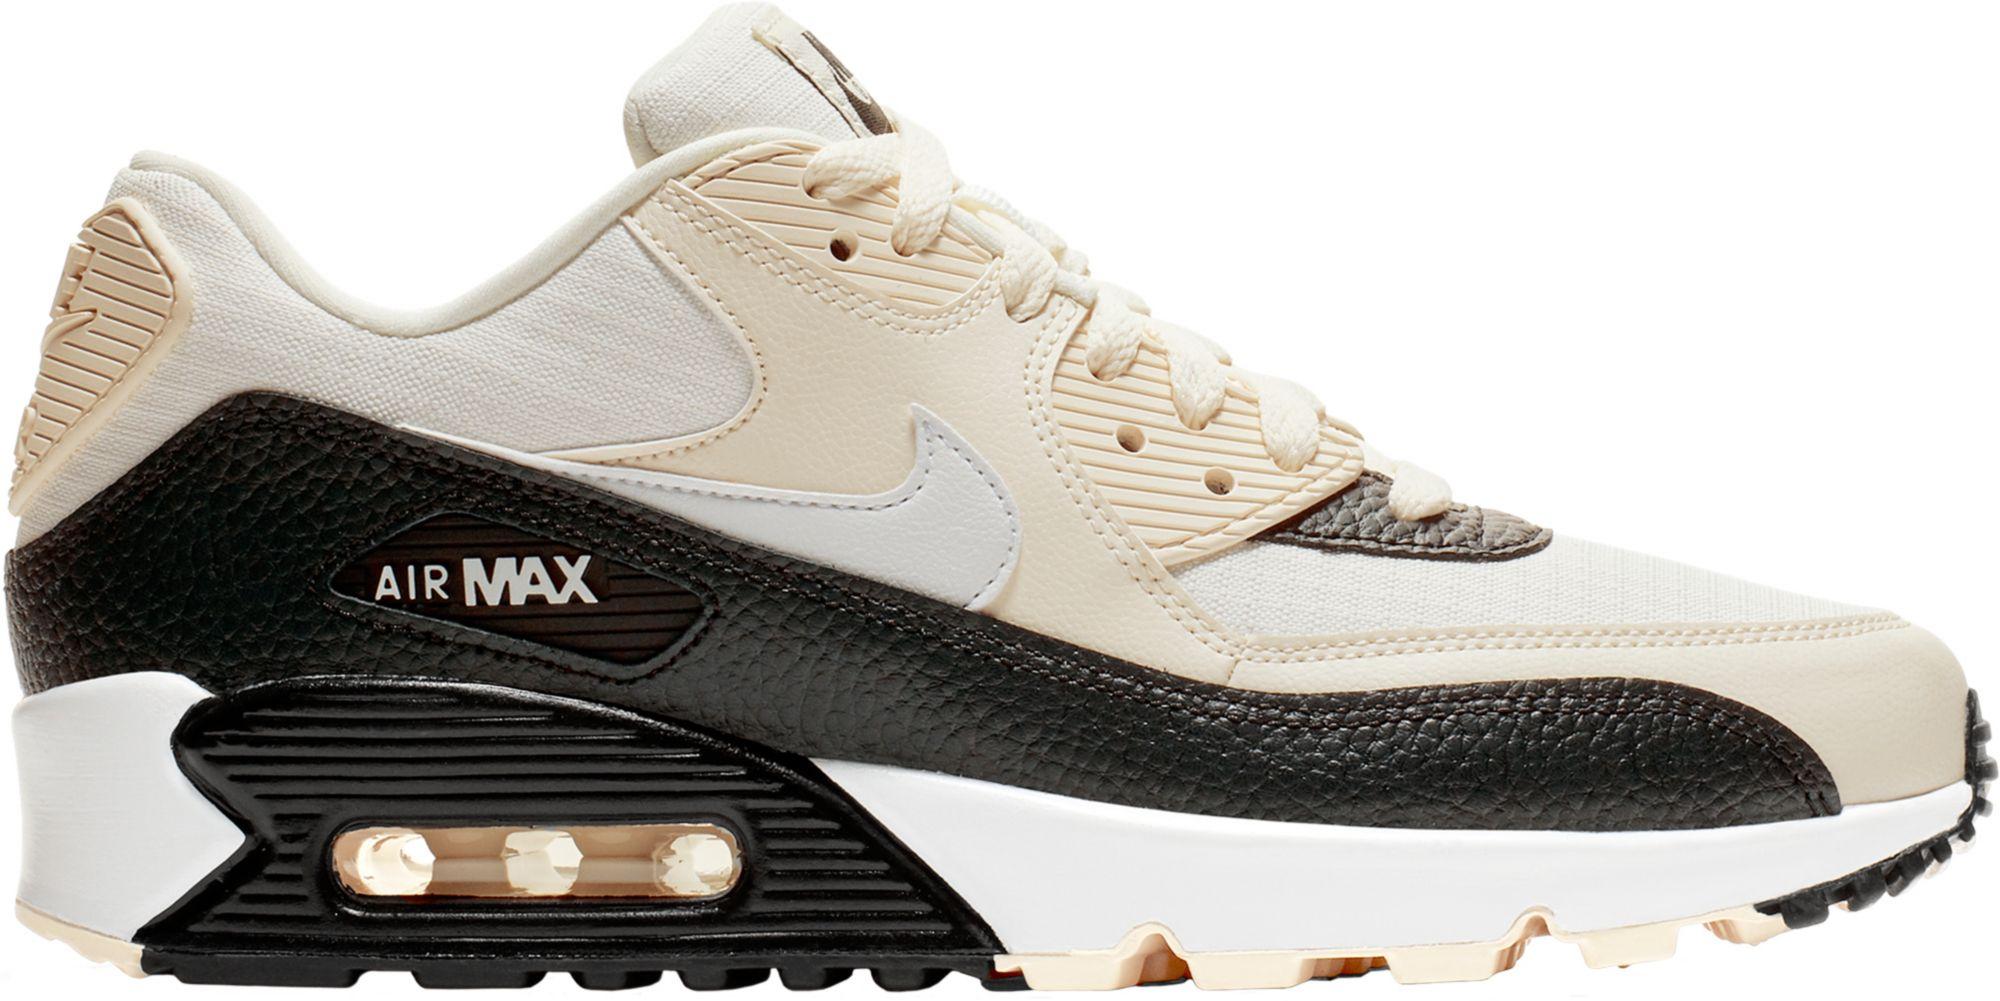 Nike Women's Air Max '90 Shoes   DICK'S Sporting